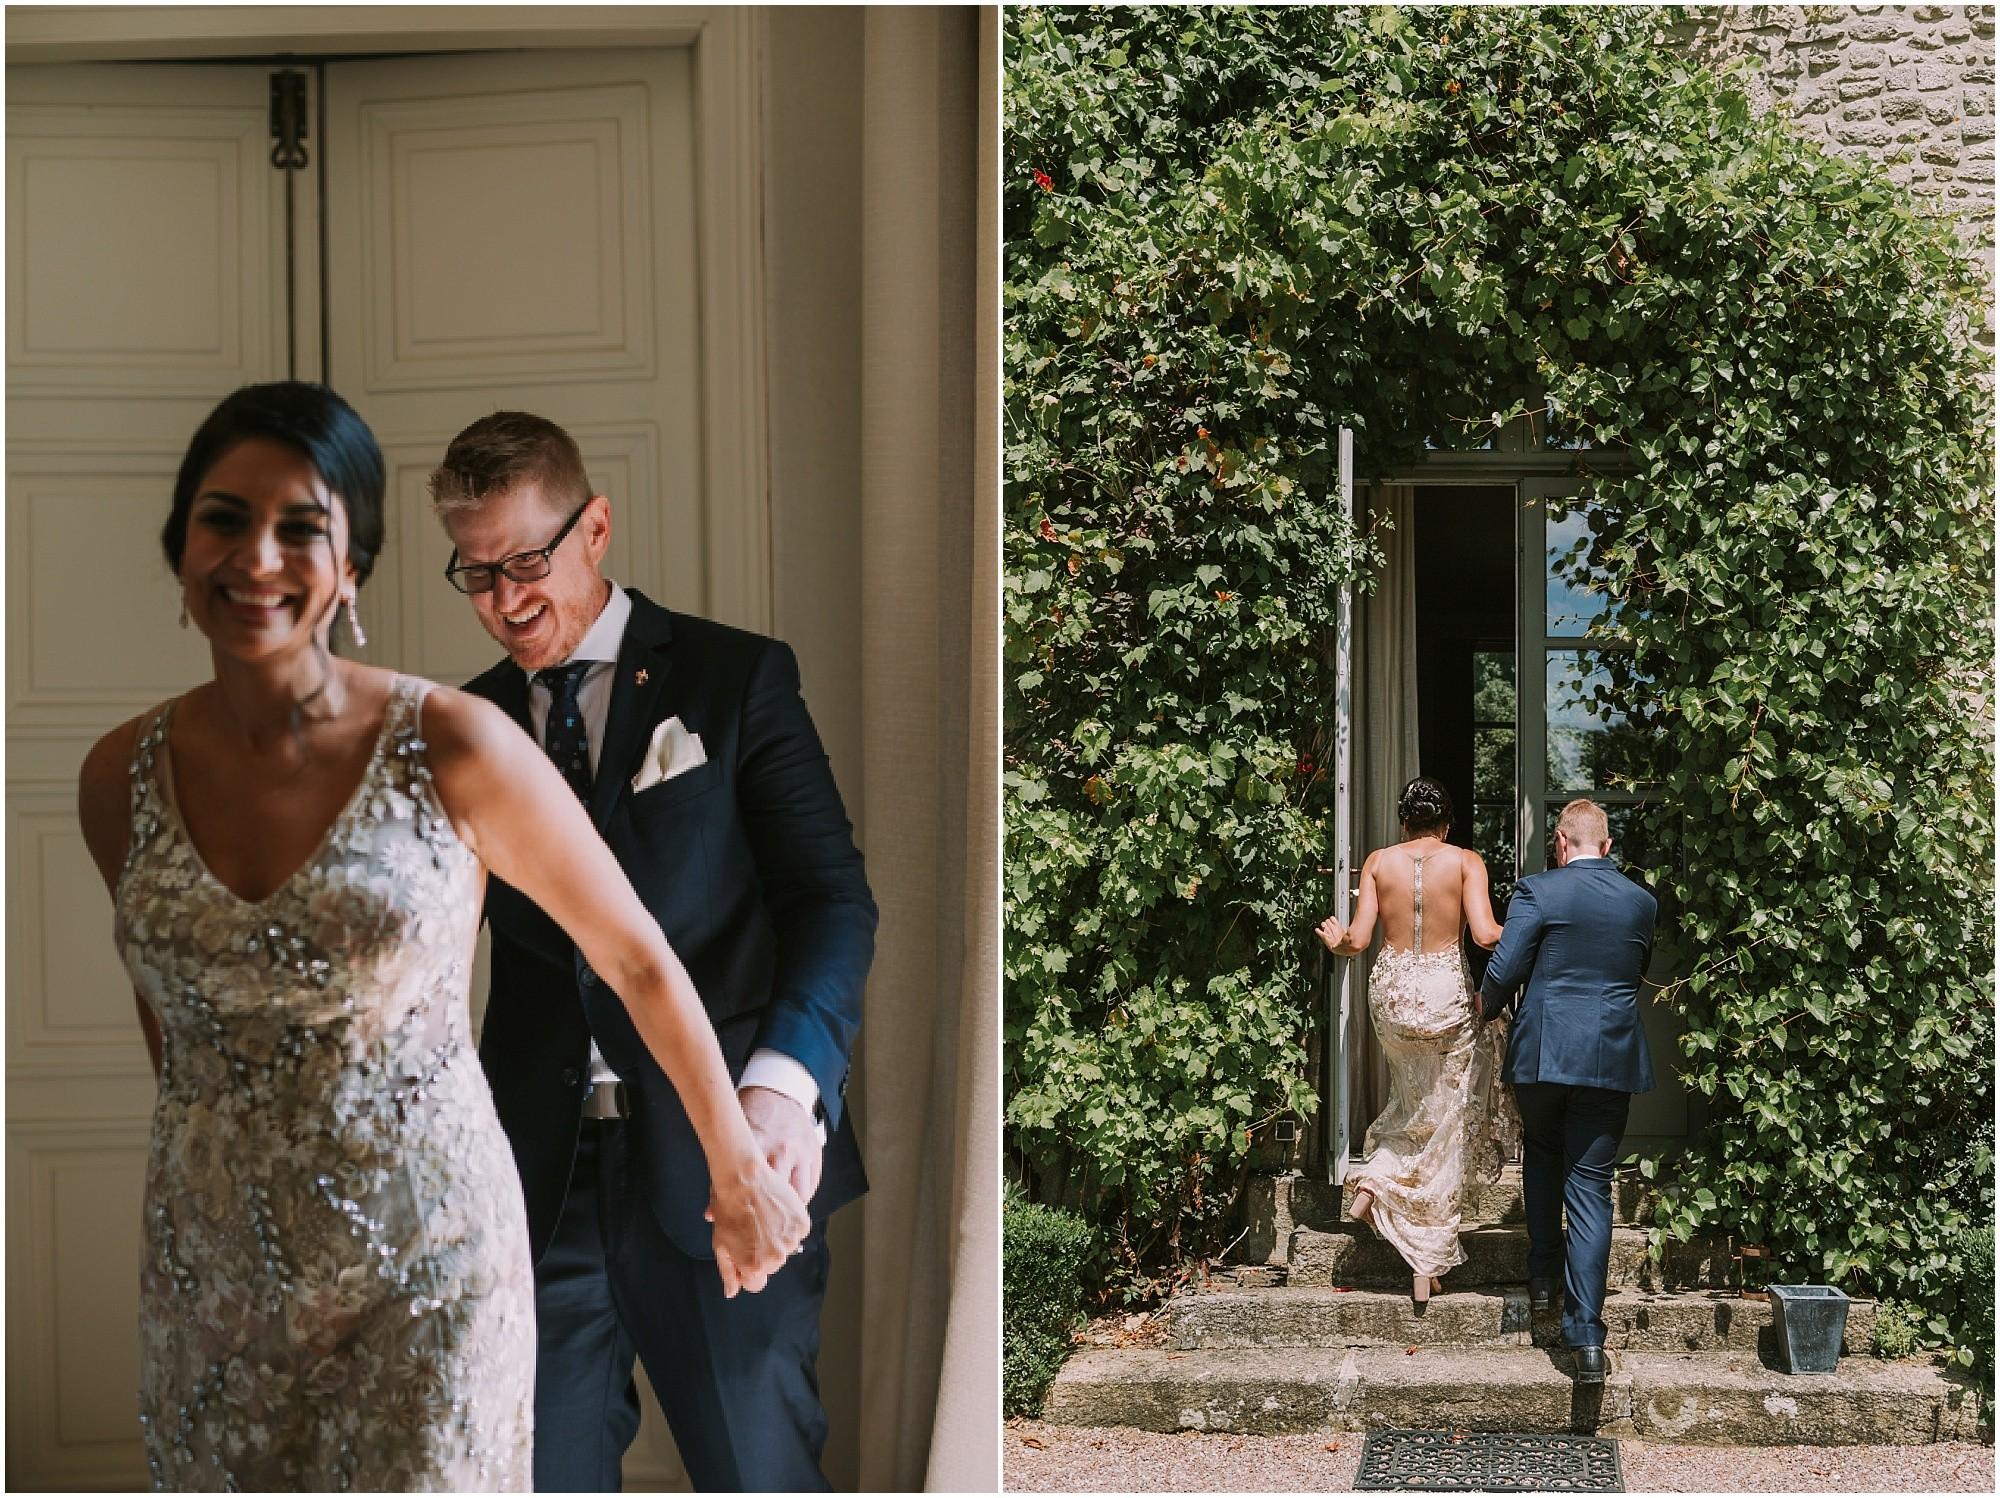 Kateryna-photos-photographer-mariage-chateau-saint-paterne-alencon-normandie-mayenne-le-mans_0025.jpg